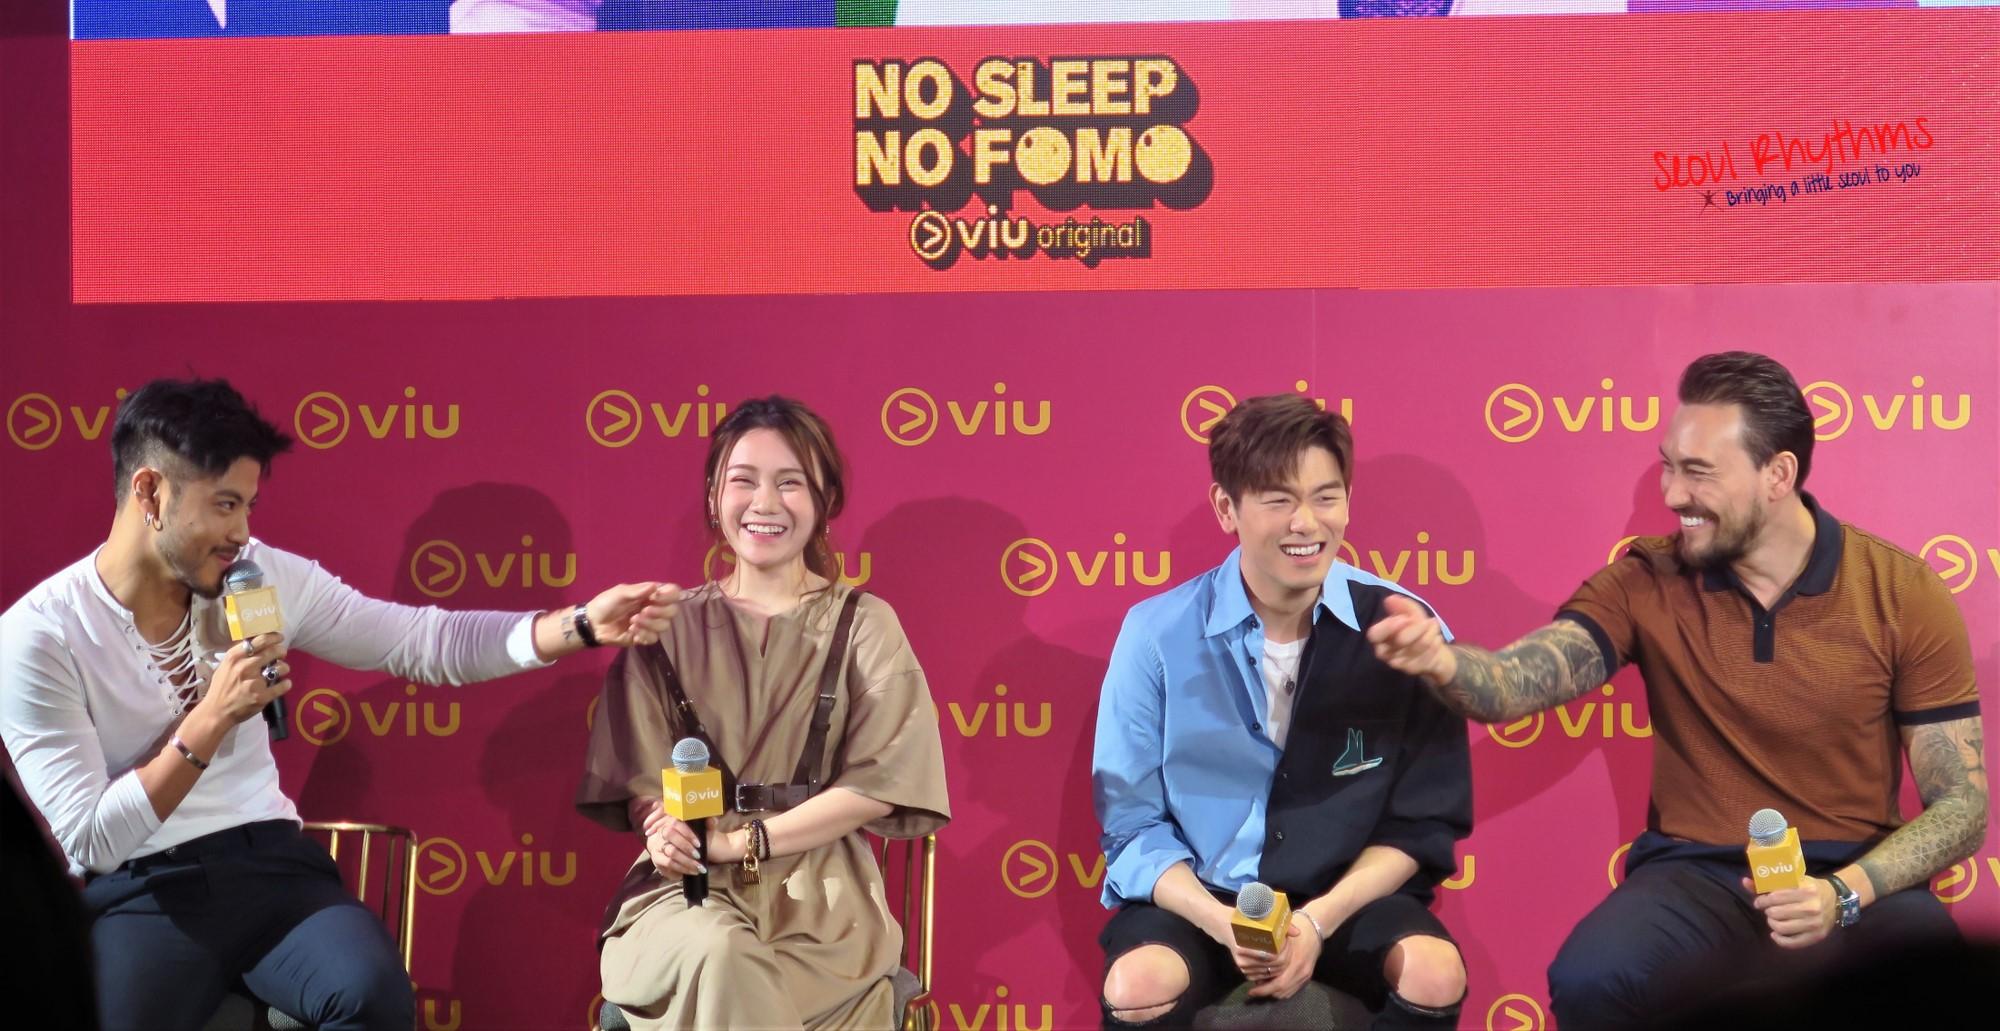 Viu launches new show No Sleep No FOMO | Seoul Rhythms